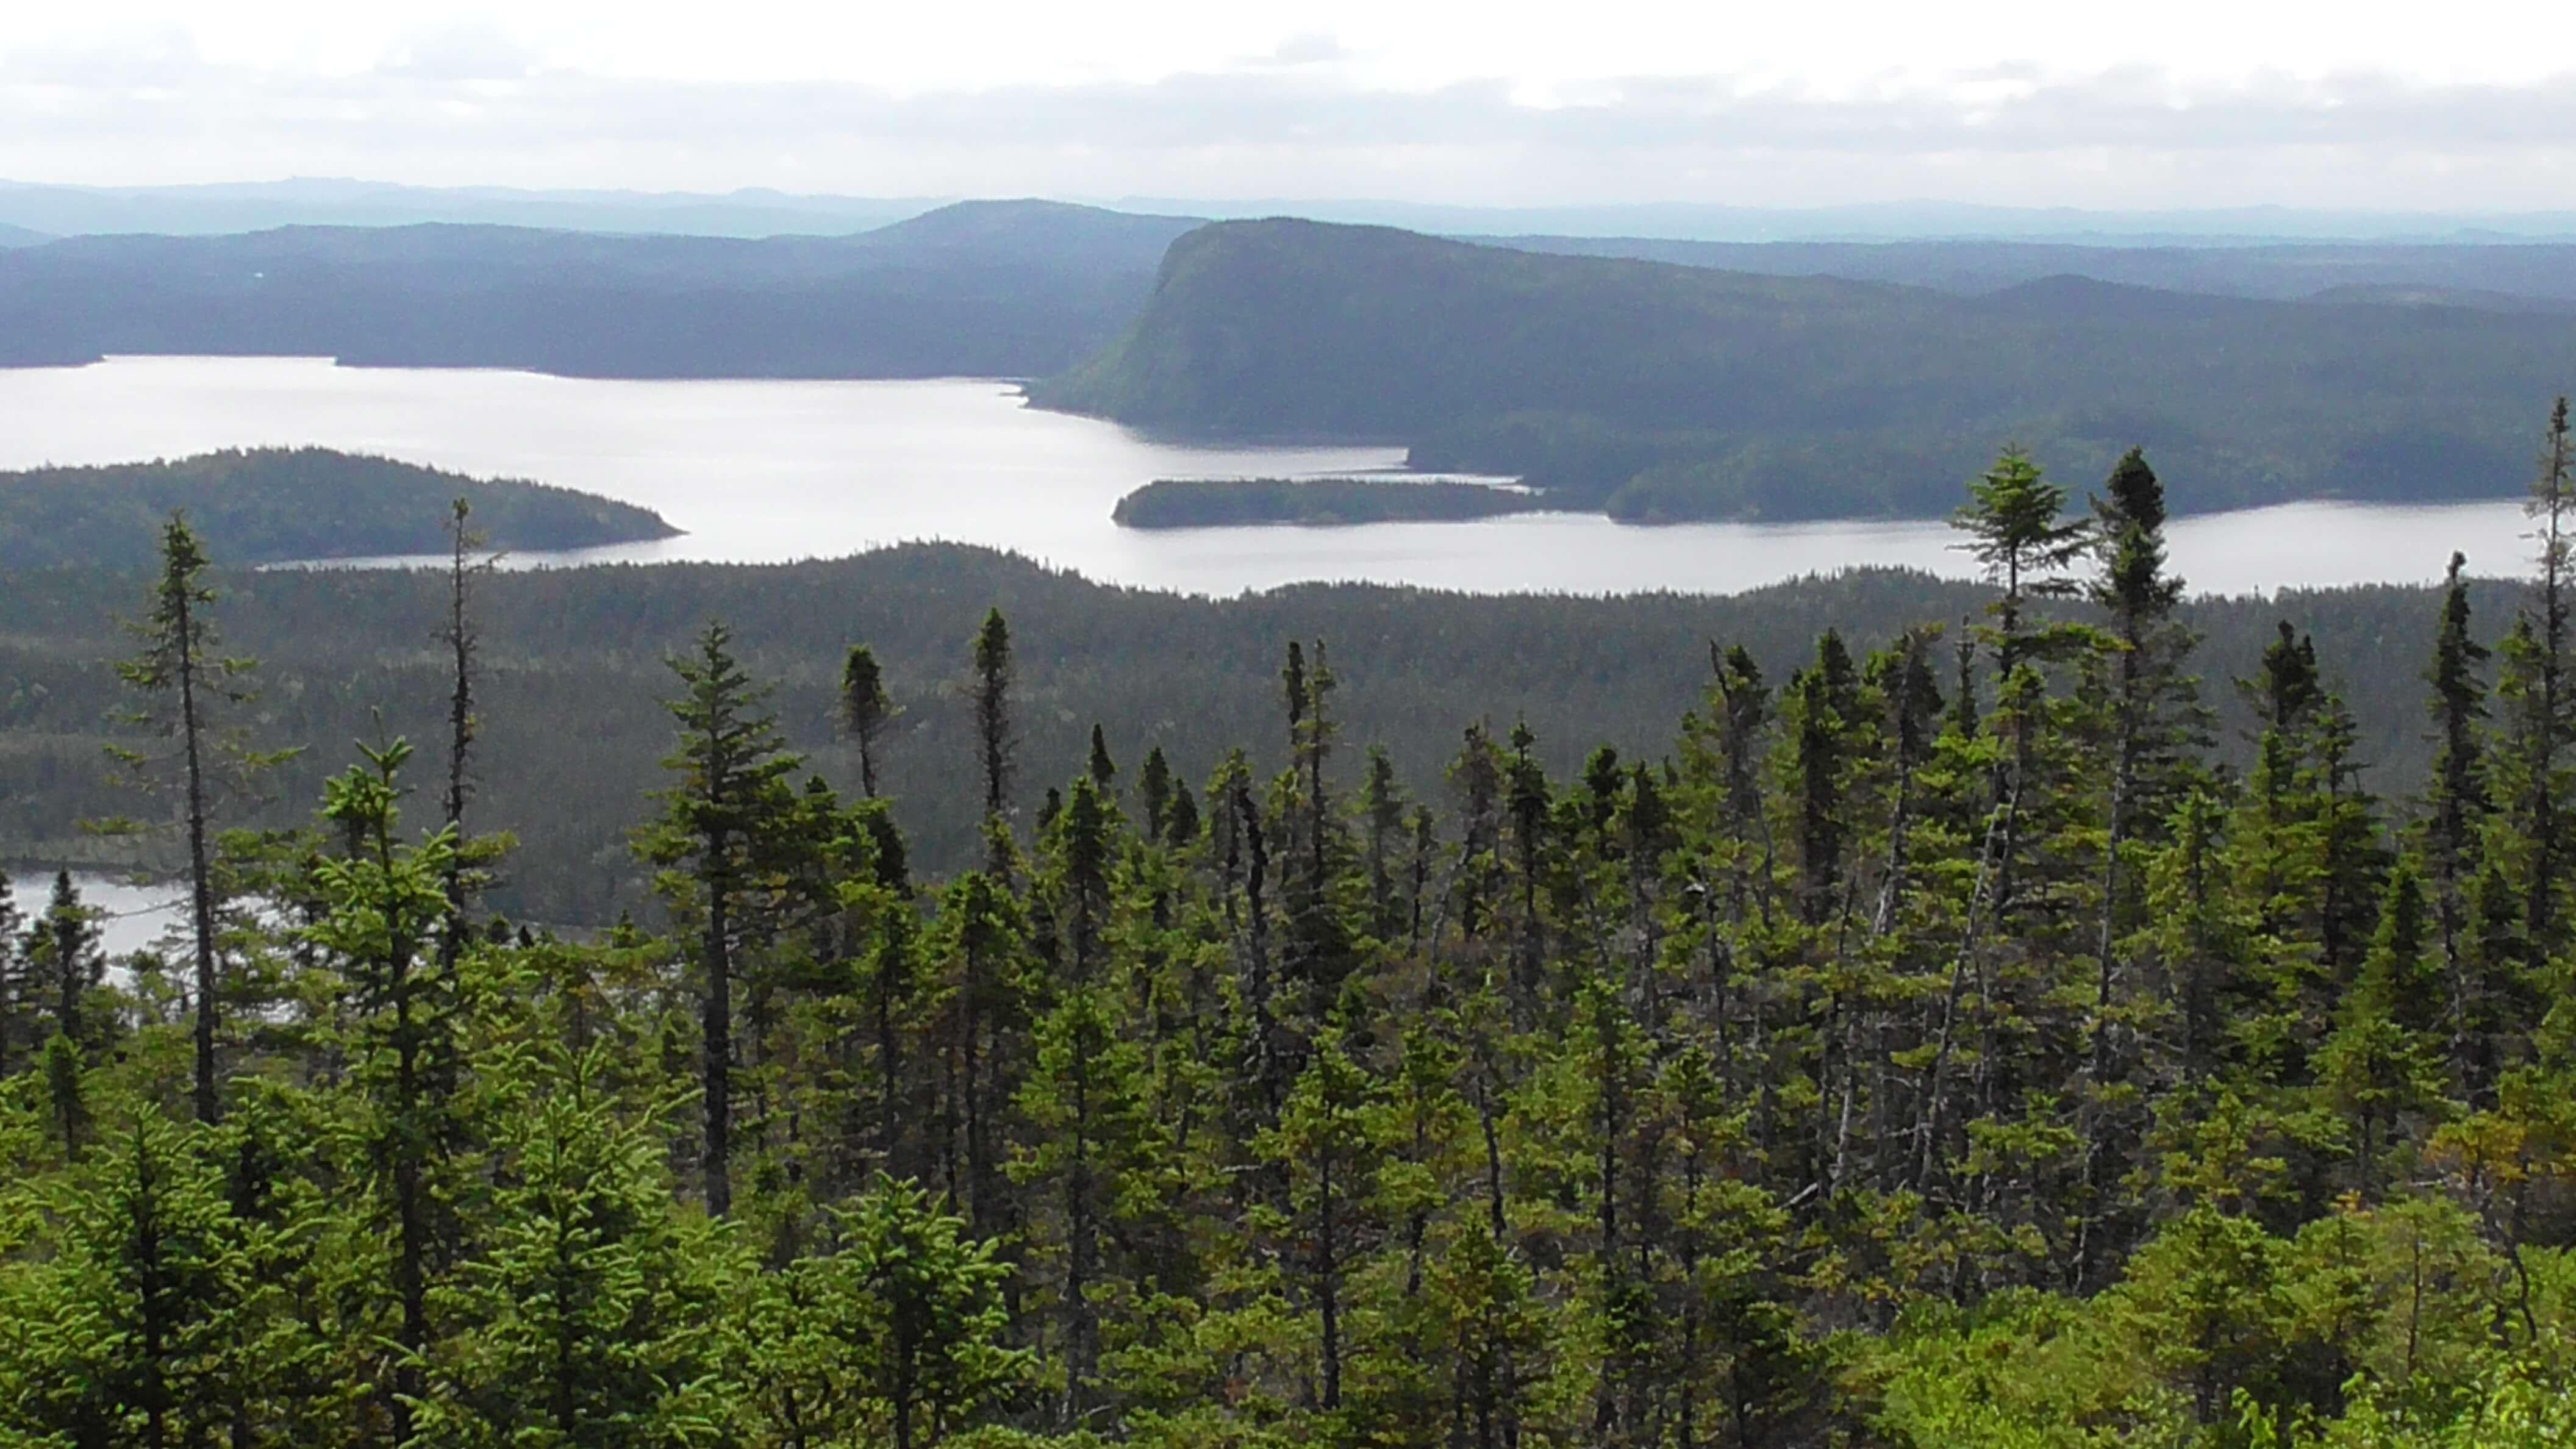 View from Blue Hill, Terra Nova National Park, Newfoundland